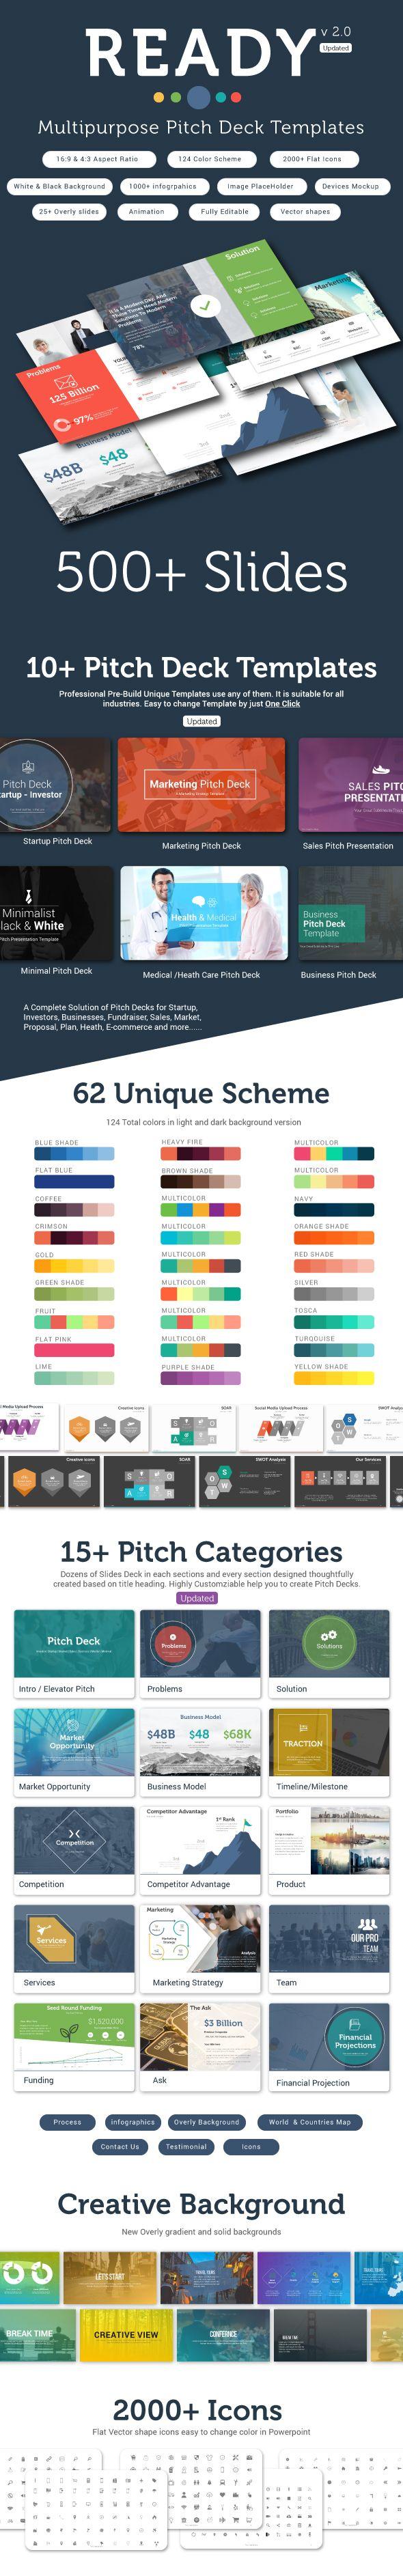 Best PowerPoint Templates Images On Pinterest Font Logo - Awesome slide deck templates scheme